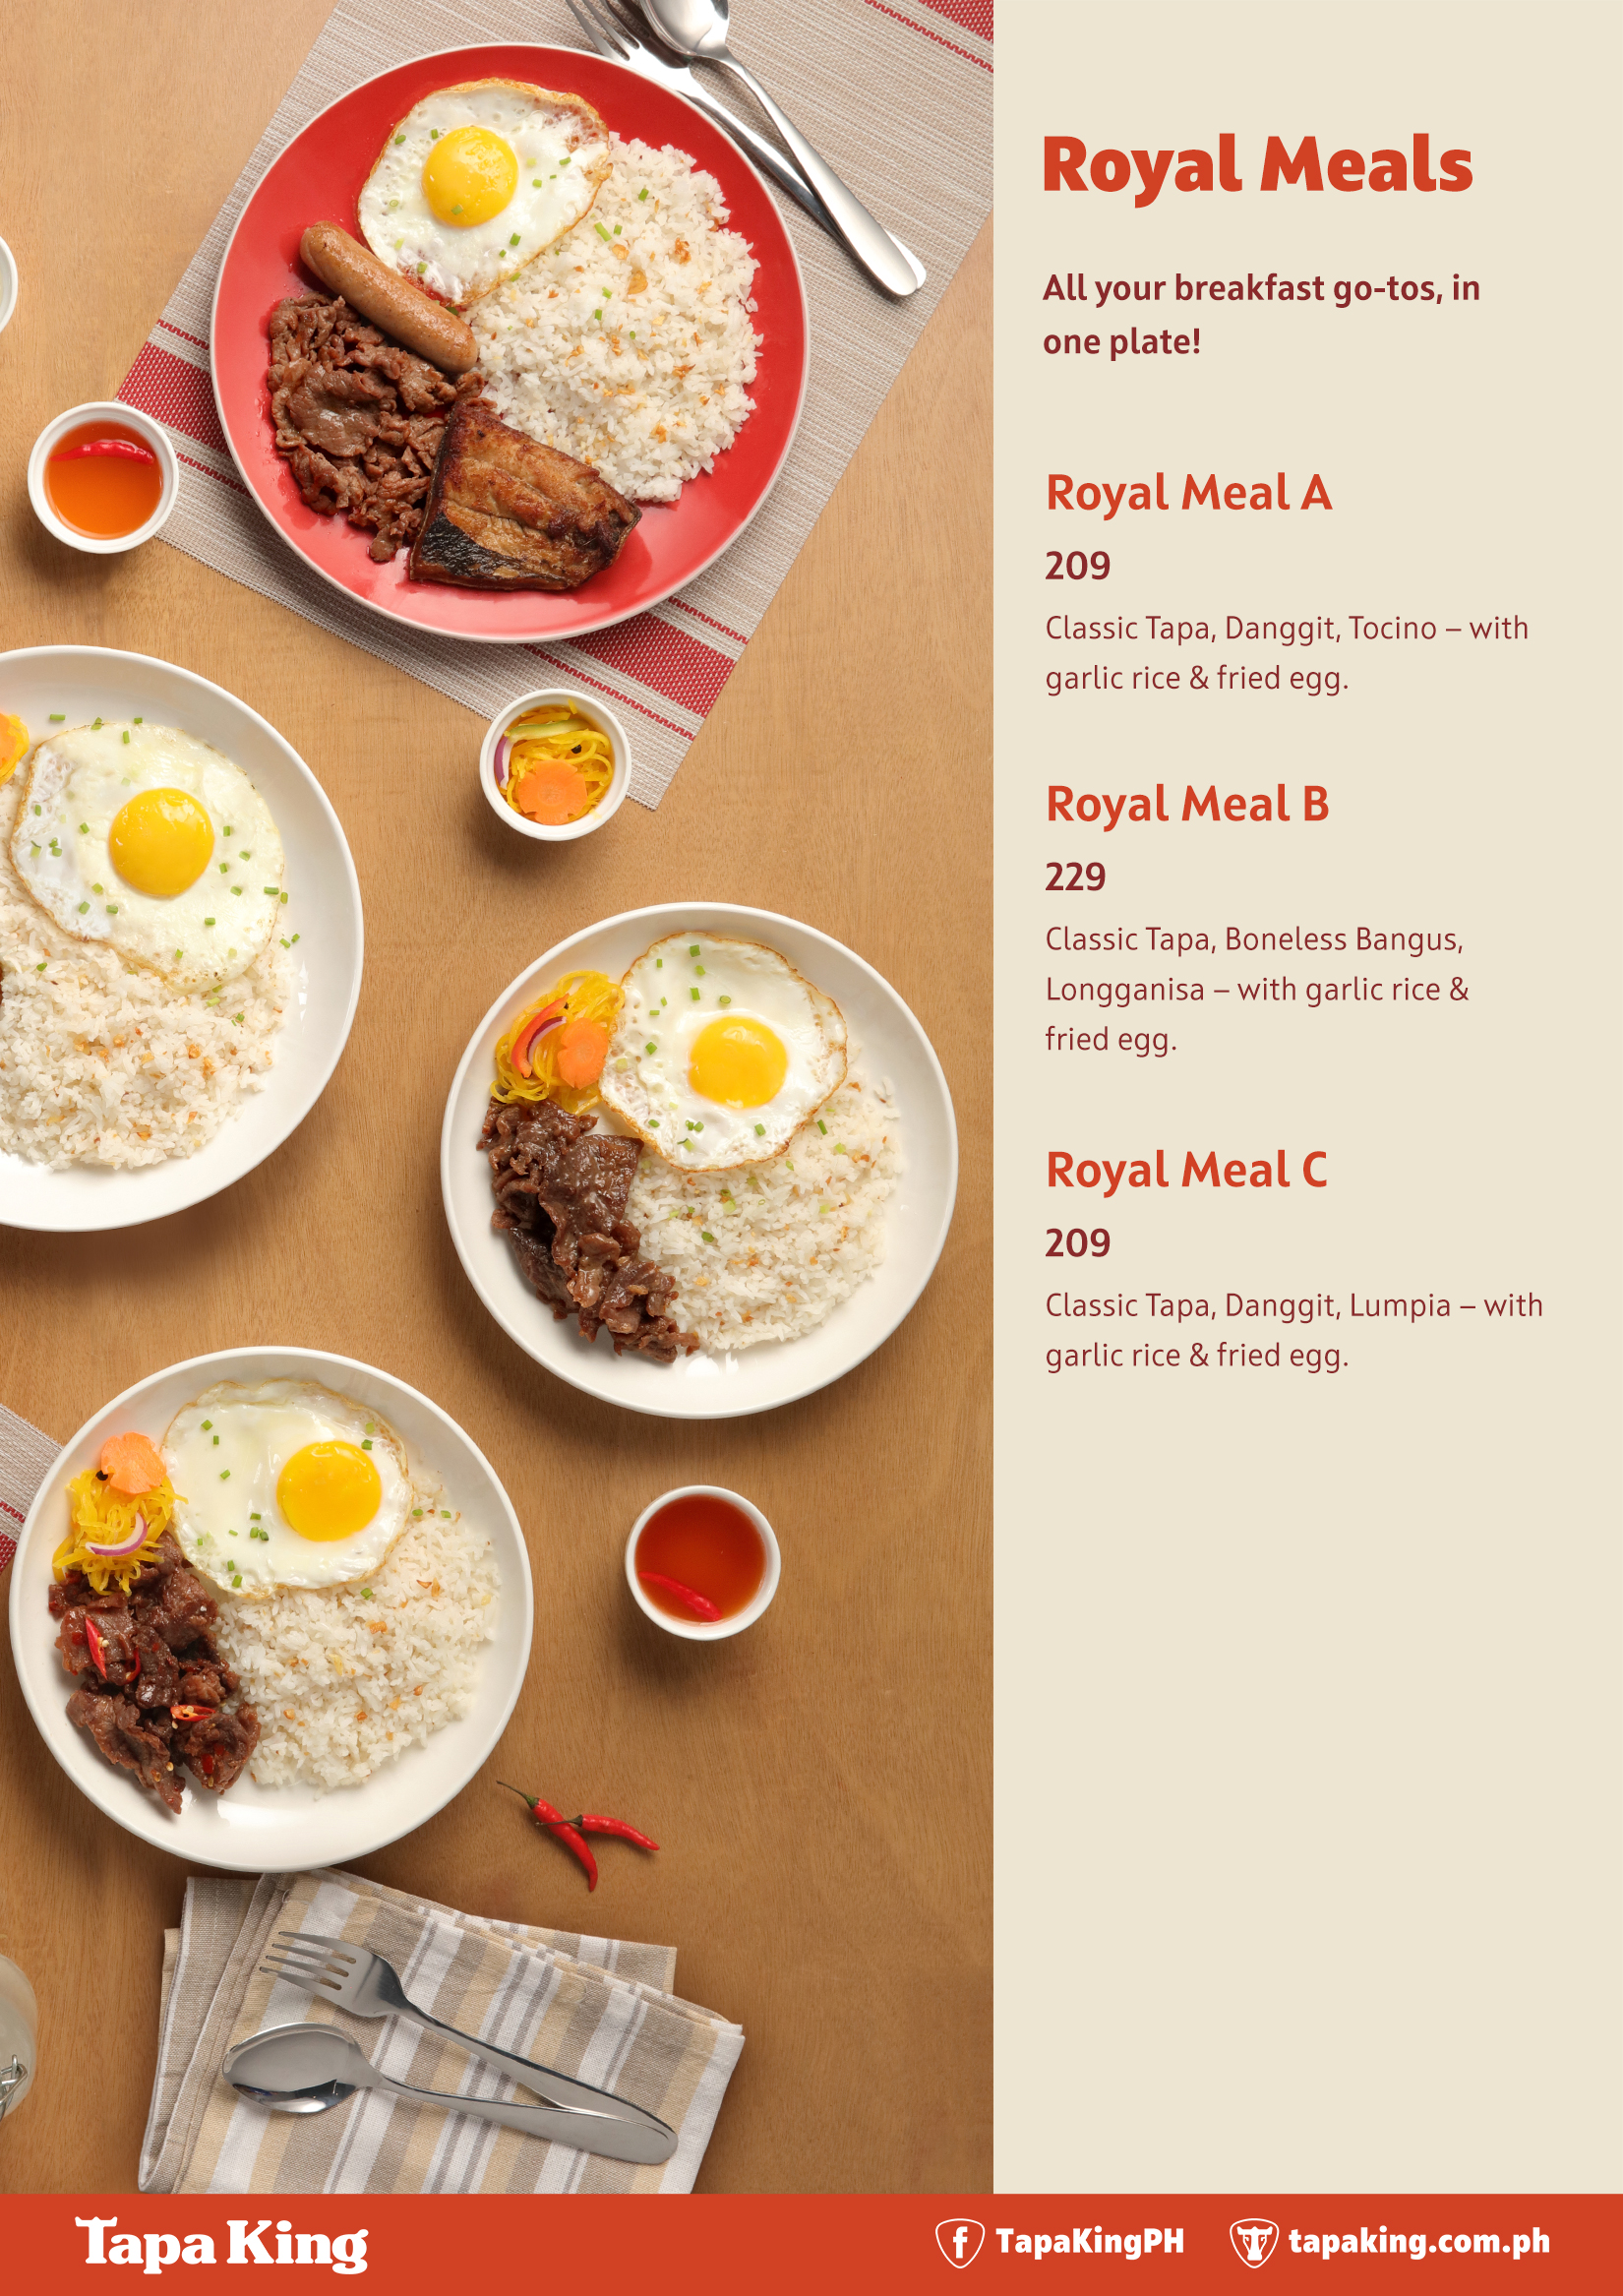 Royal Meals